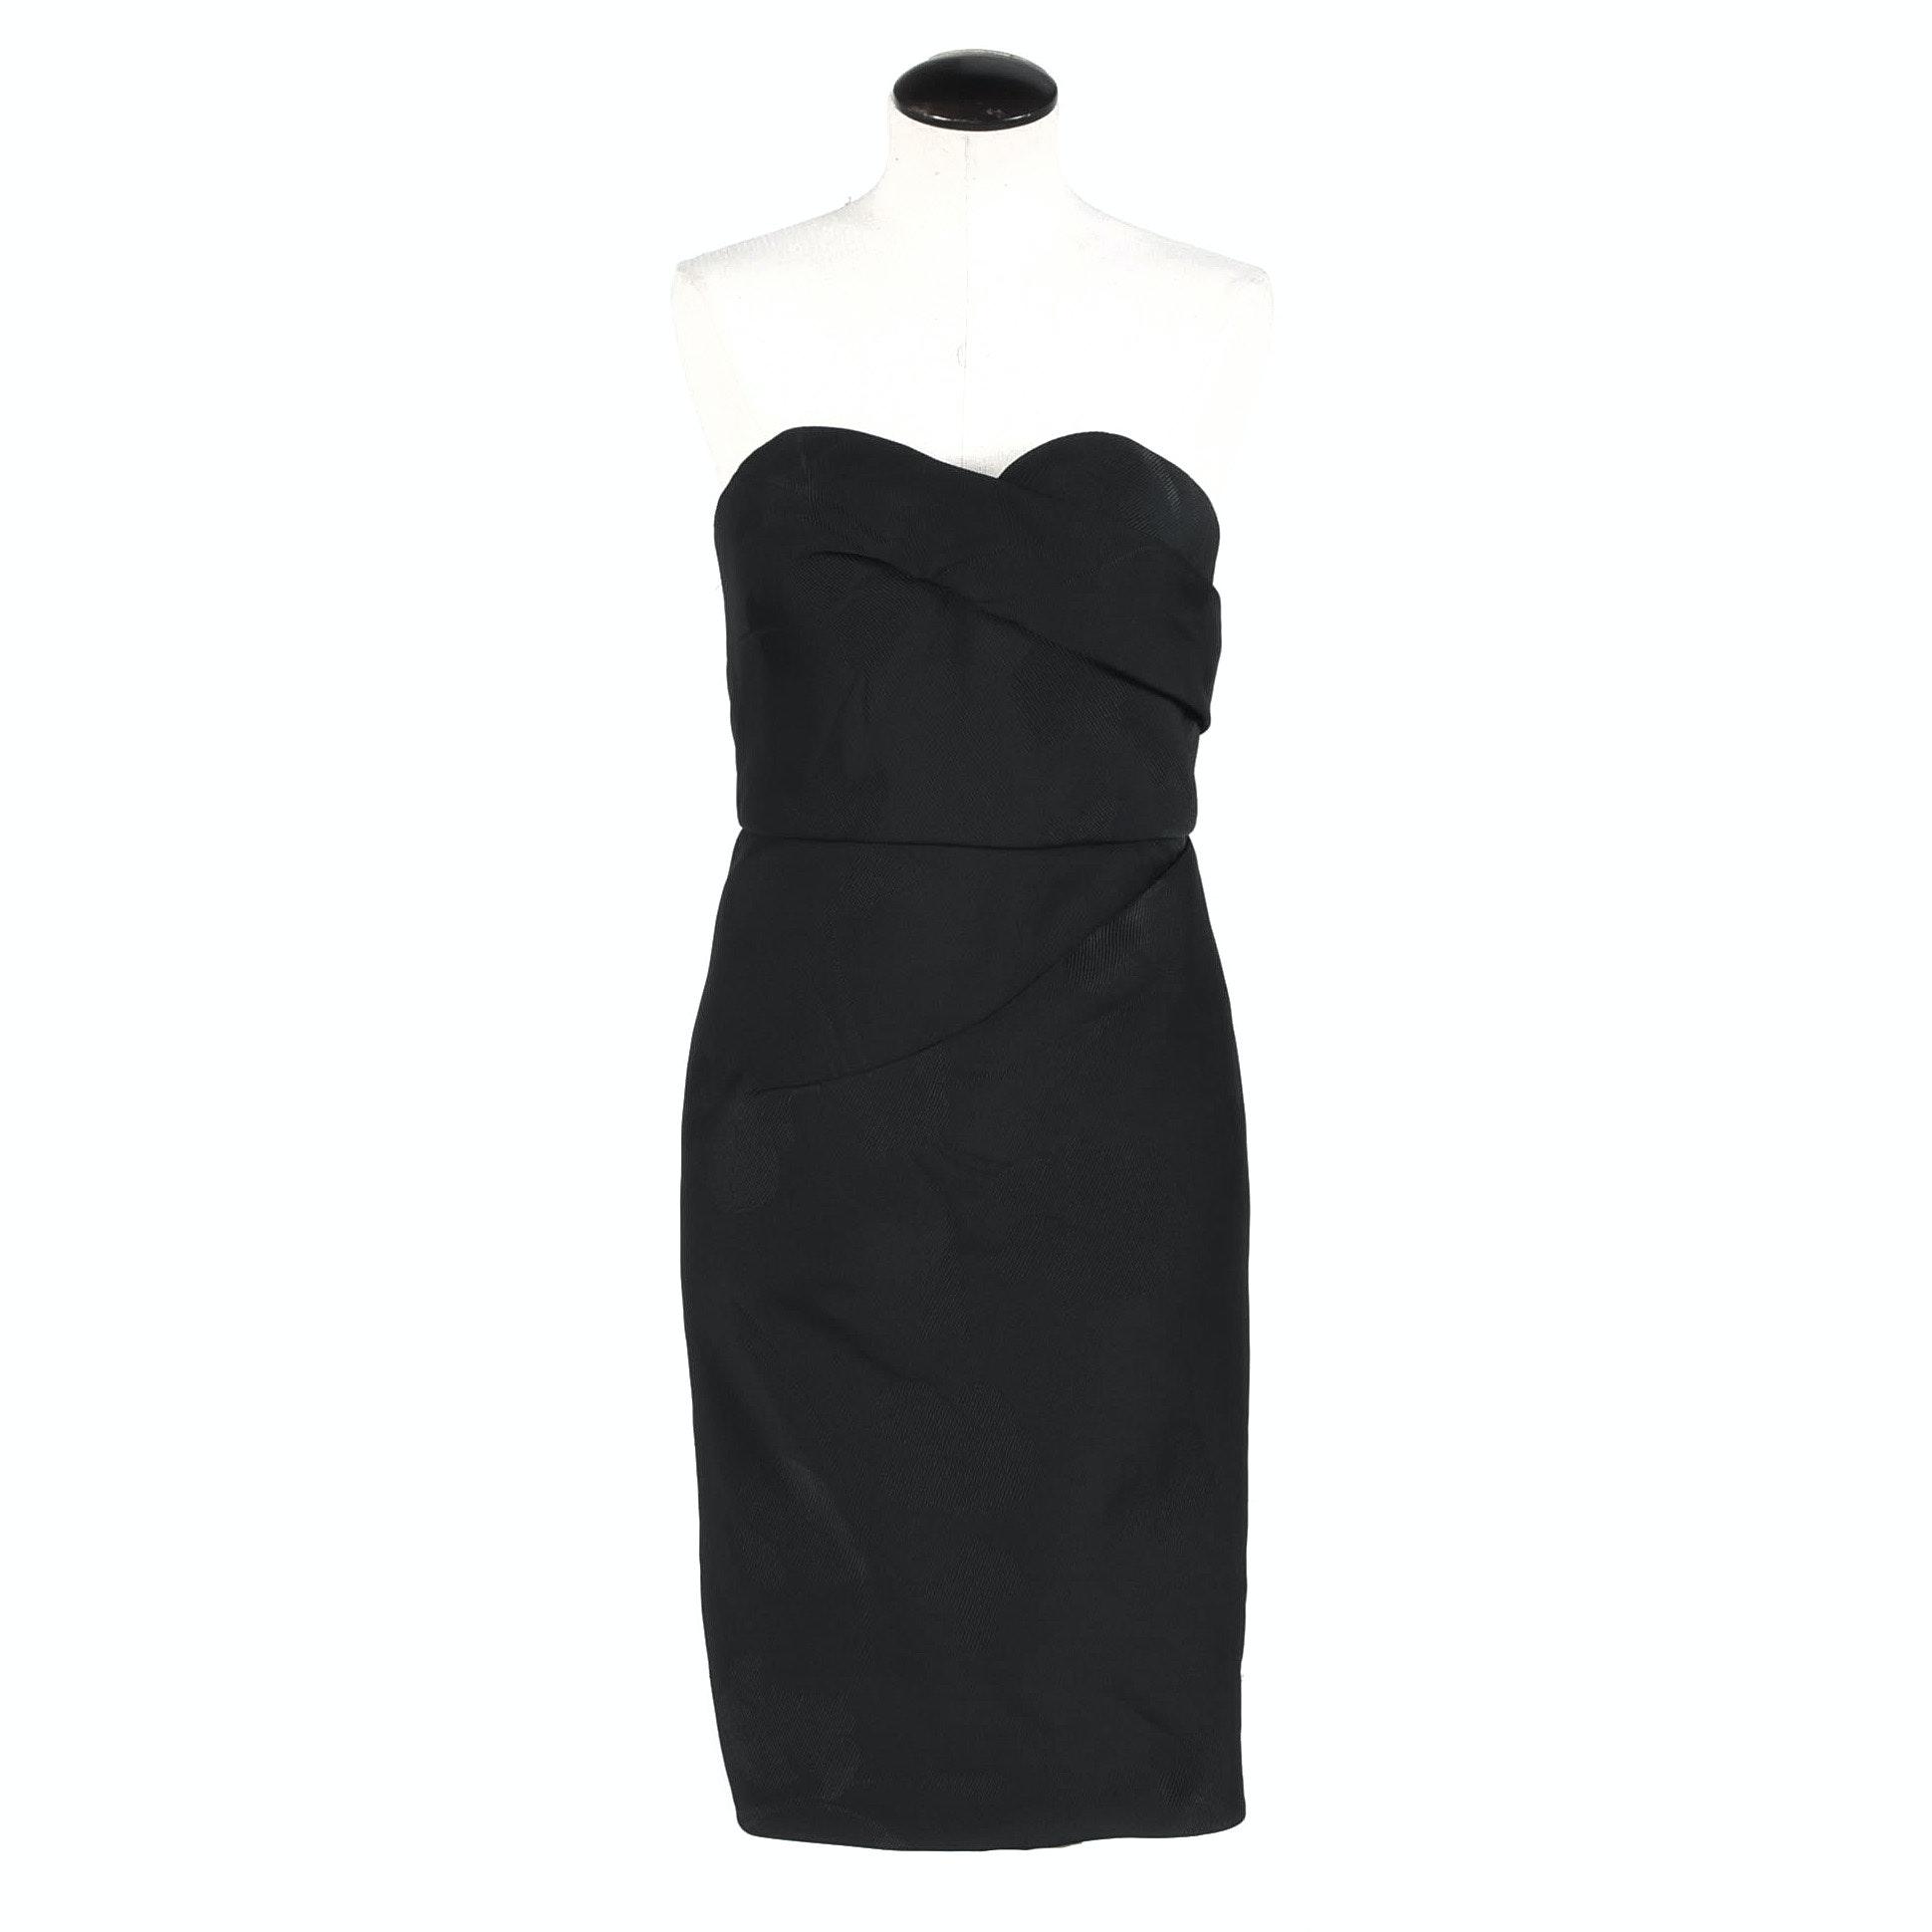 Oscar de la Renta Black Strapless Cocktail Dress